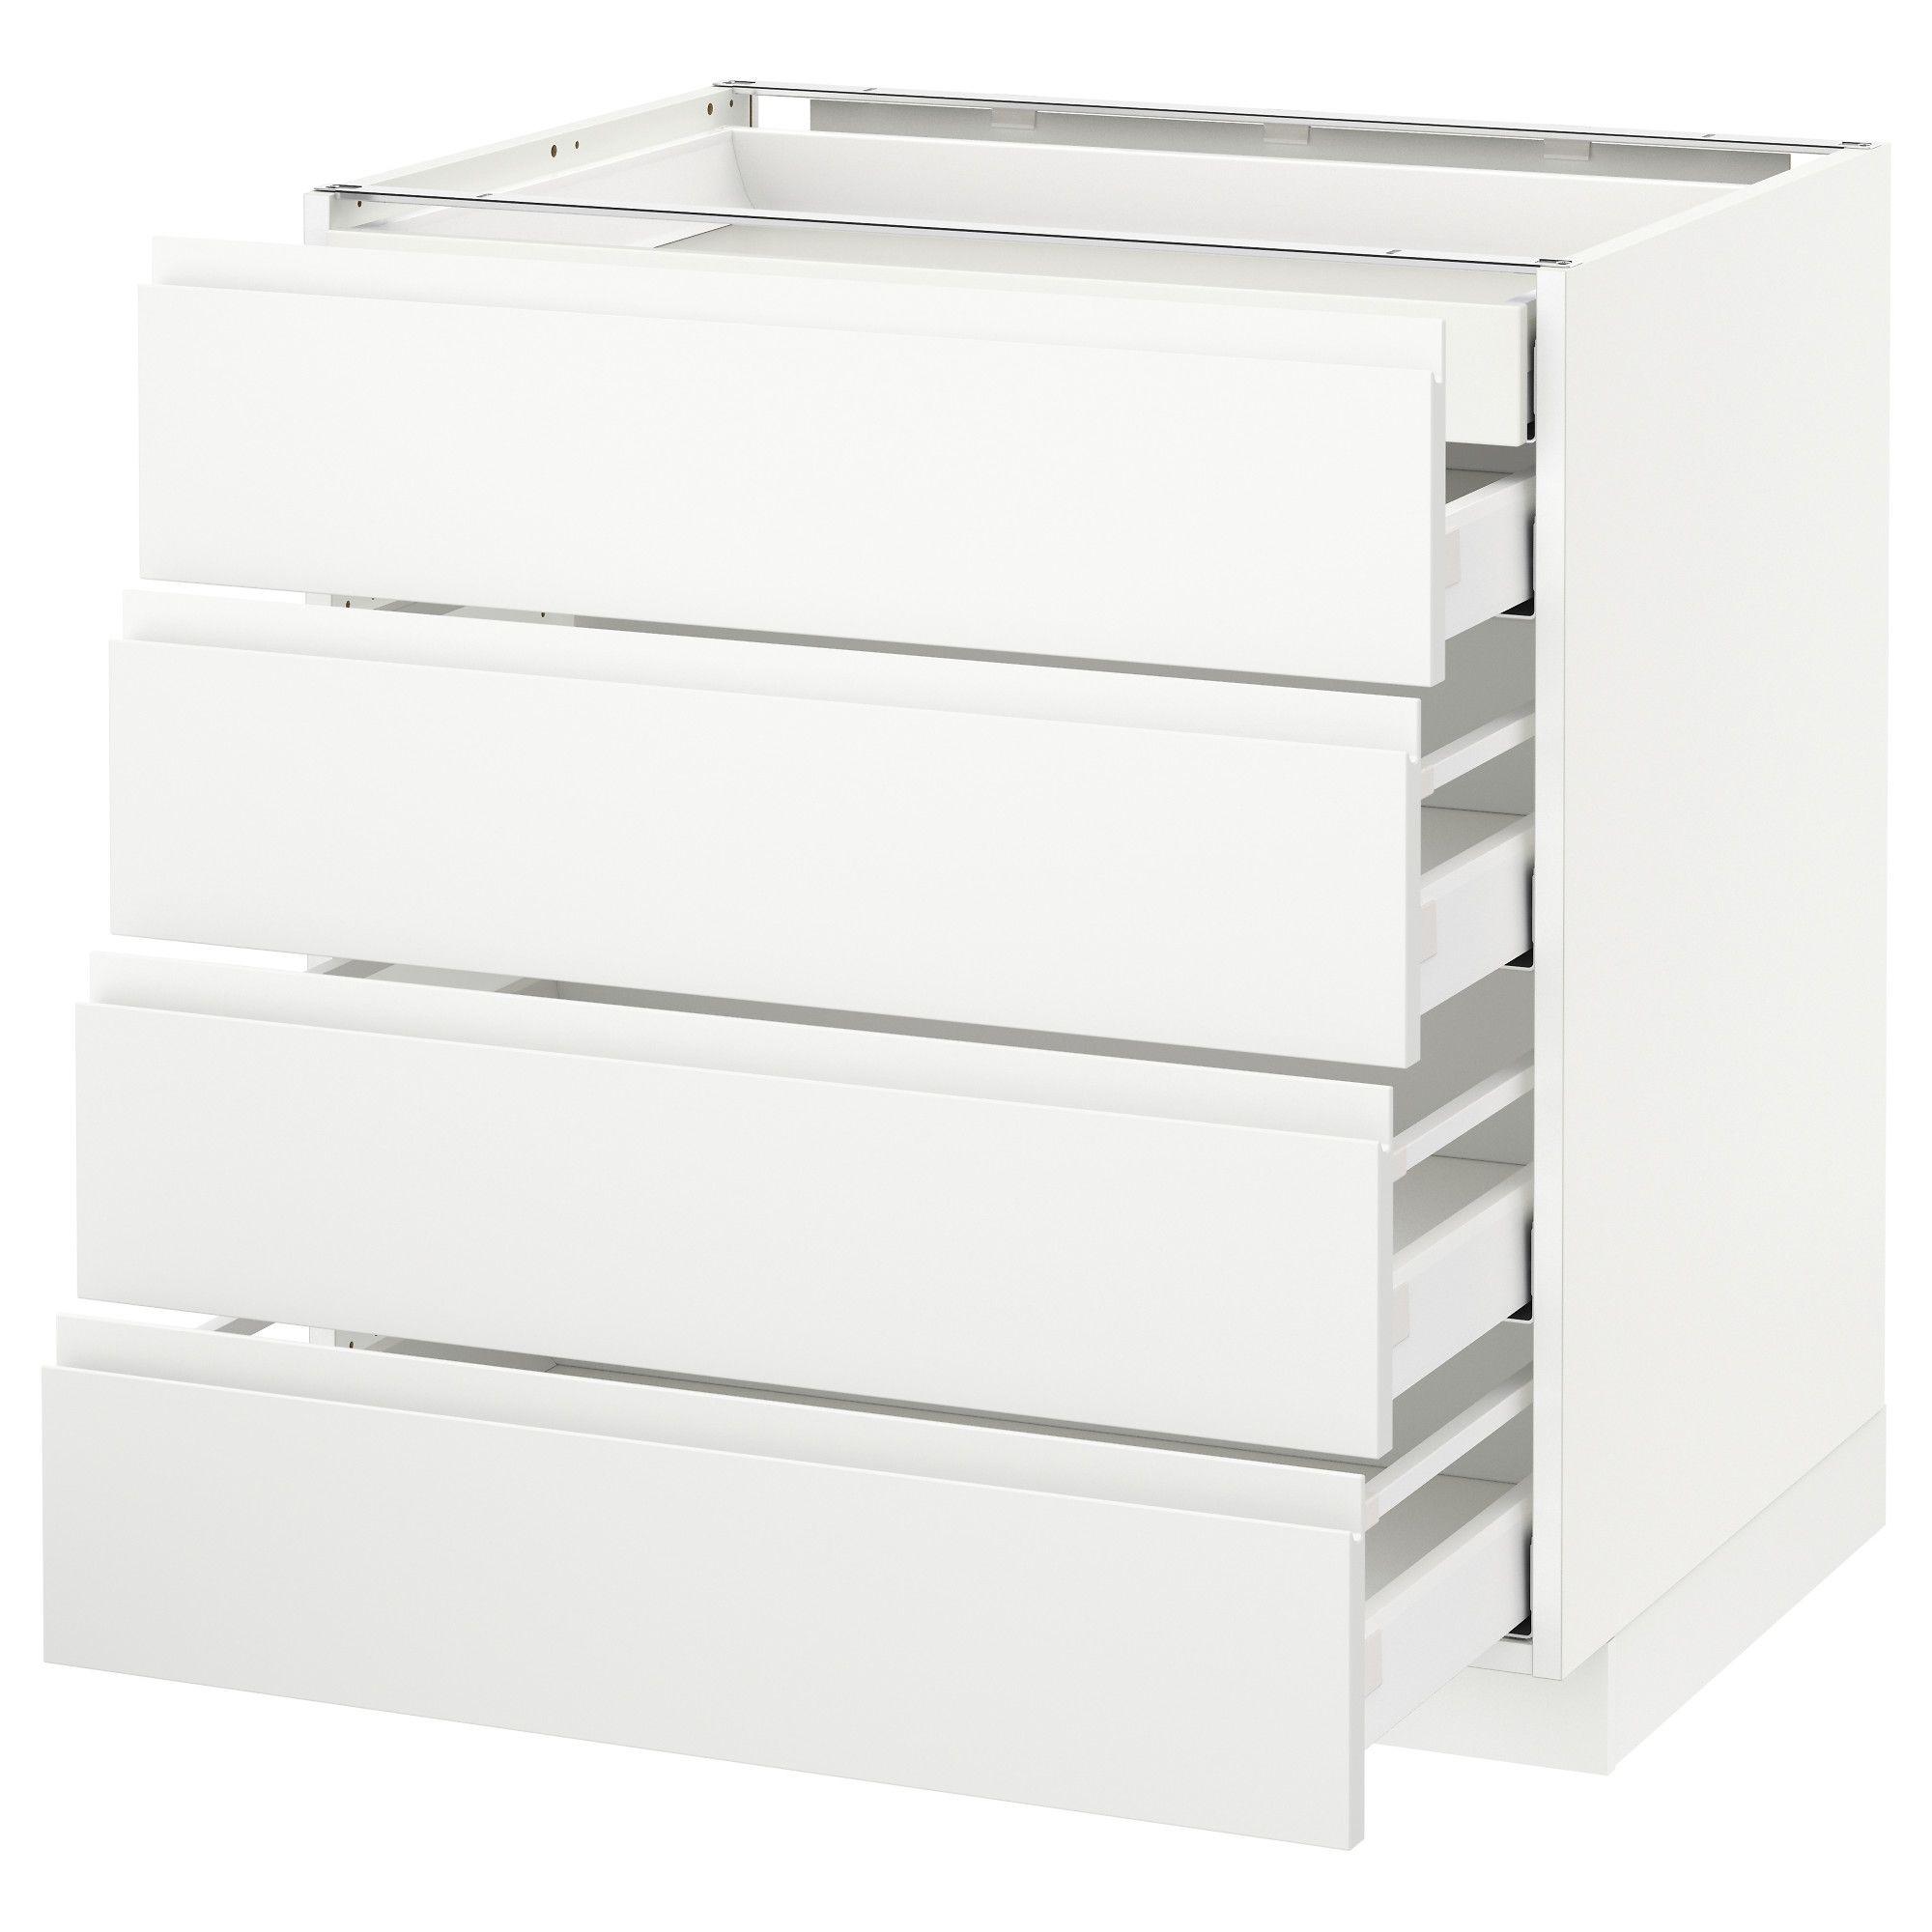 Metod Ikea Modular Kitchens Komnit Furniture Ikea Plastic Drawers Furniture